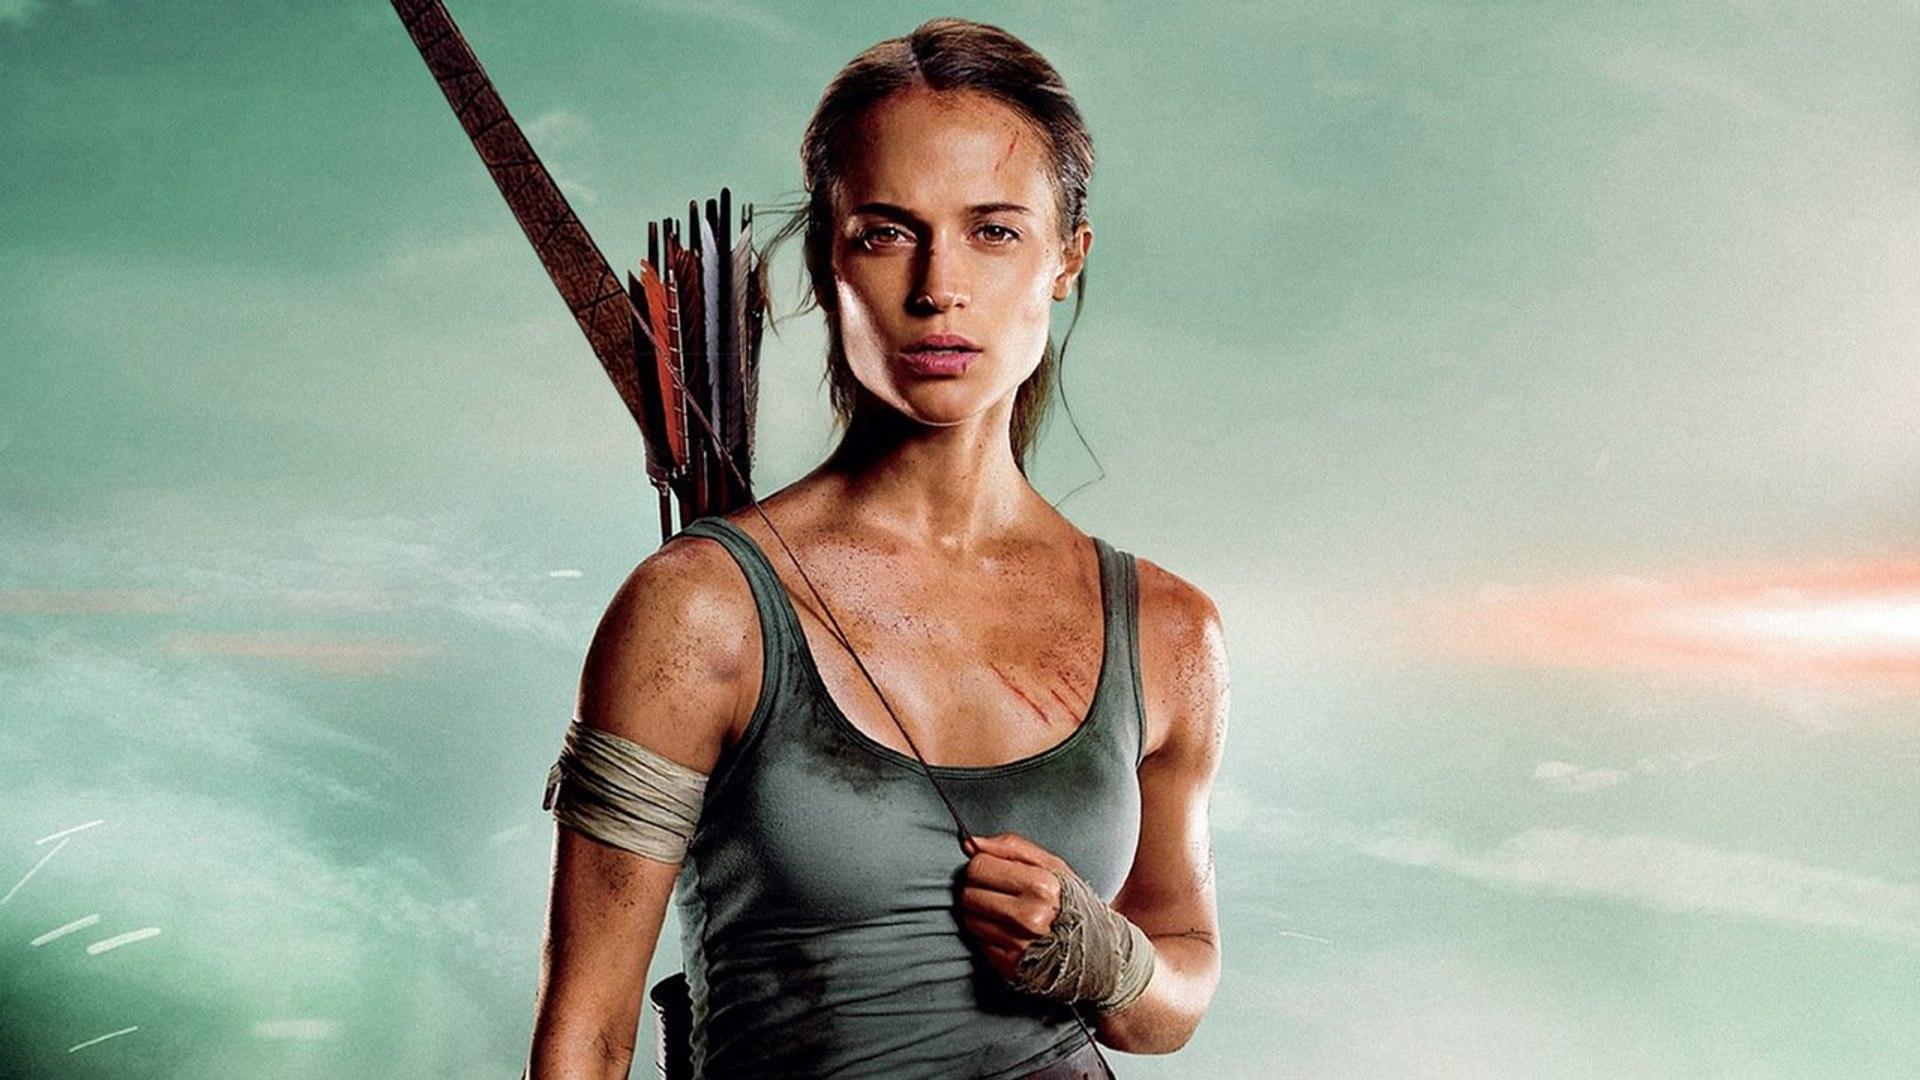 Tomb Raider Action Movie 2018 Full Movies